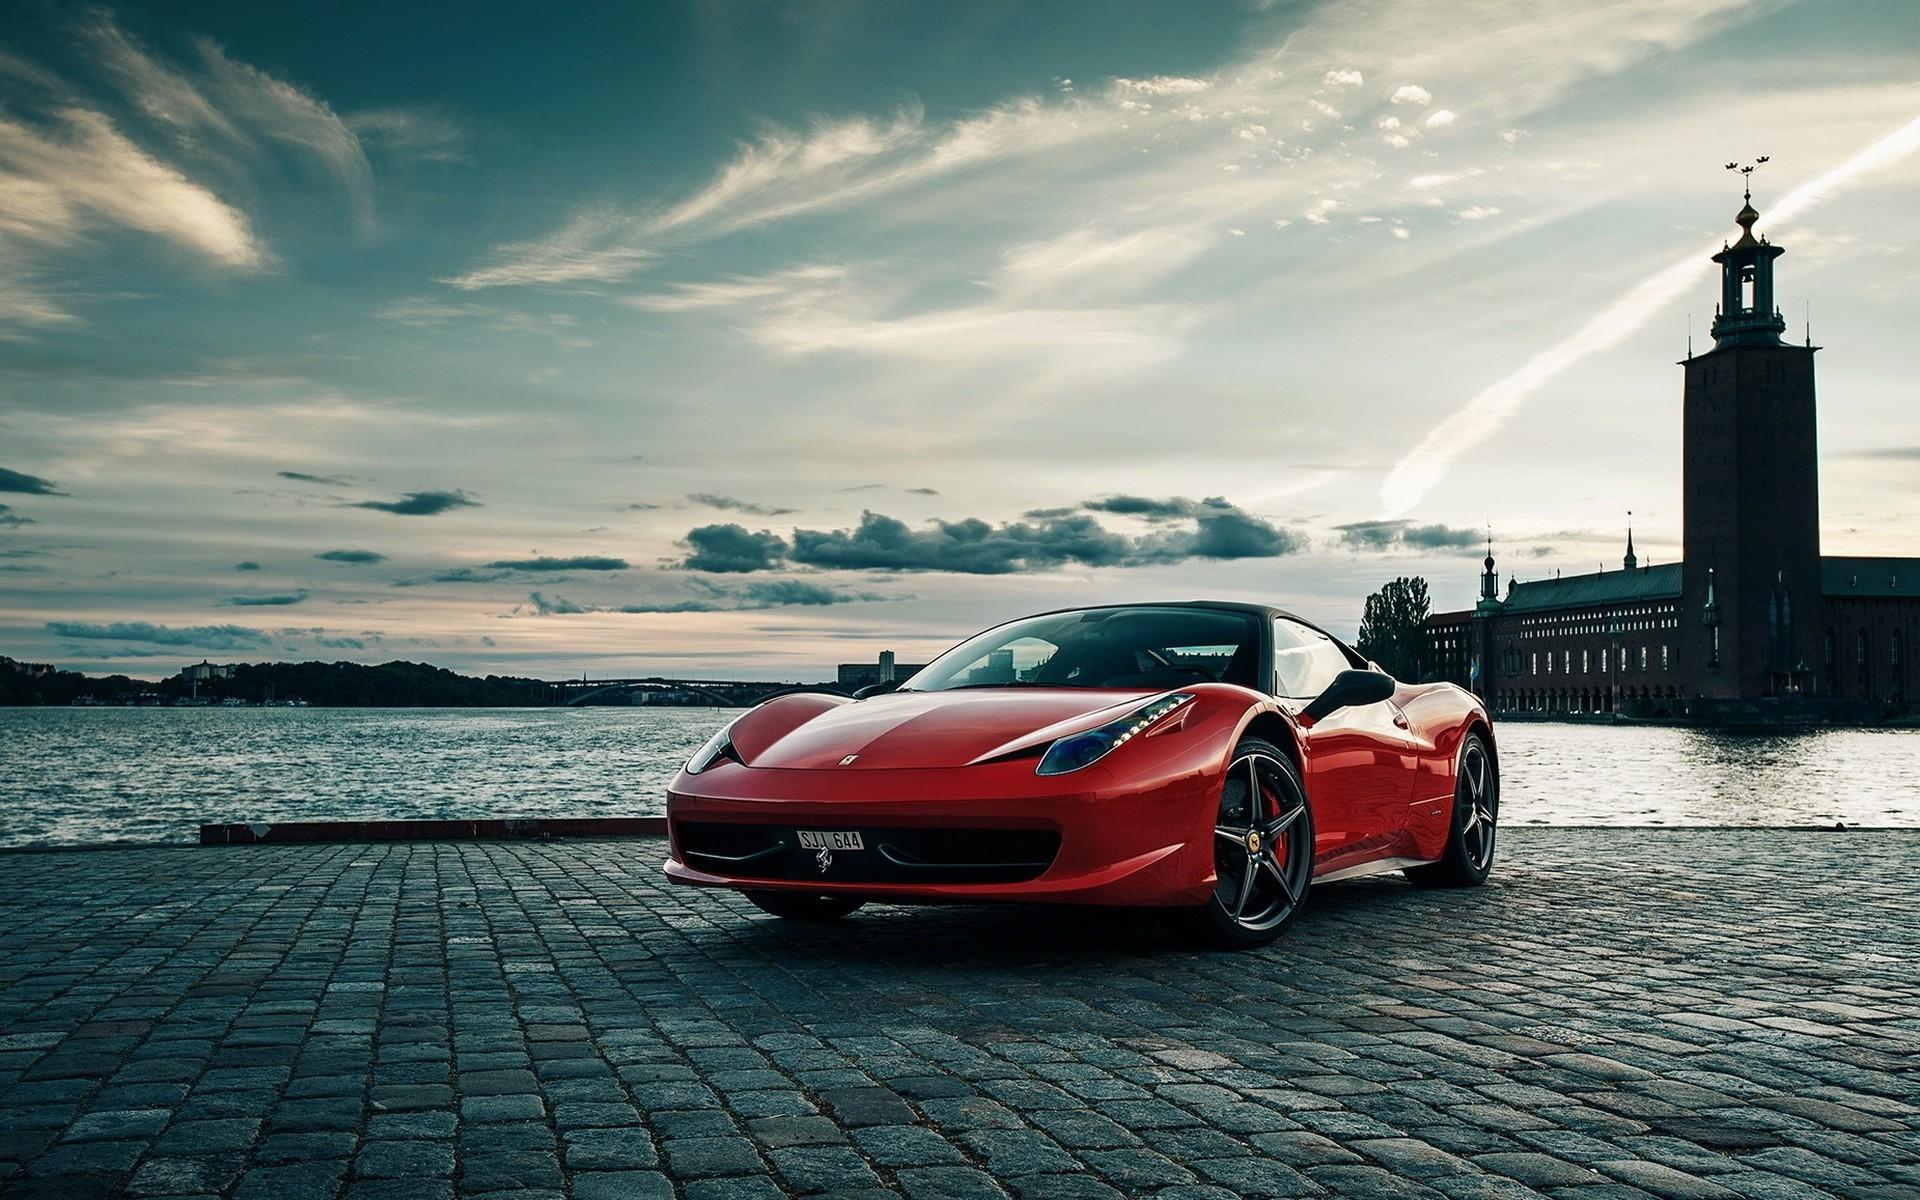 Ferrari F12 дорога забор  № 2437925 без смс